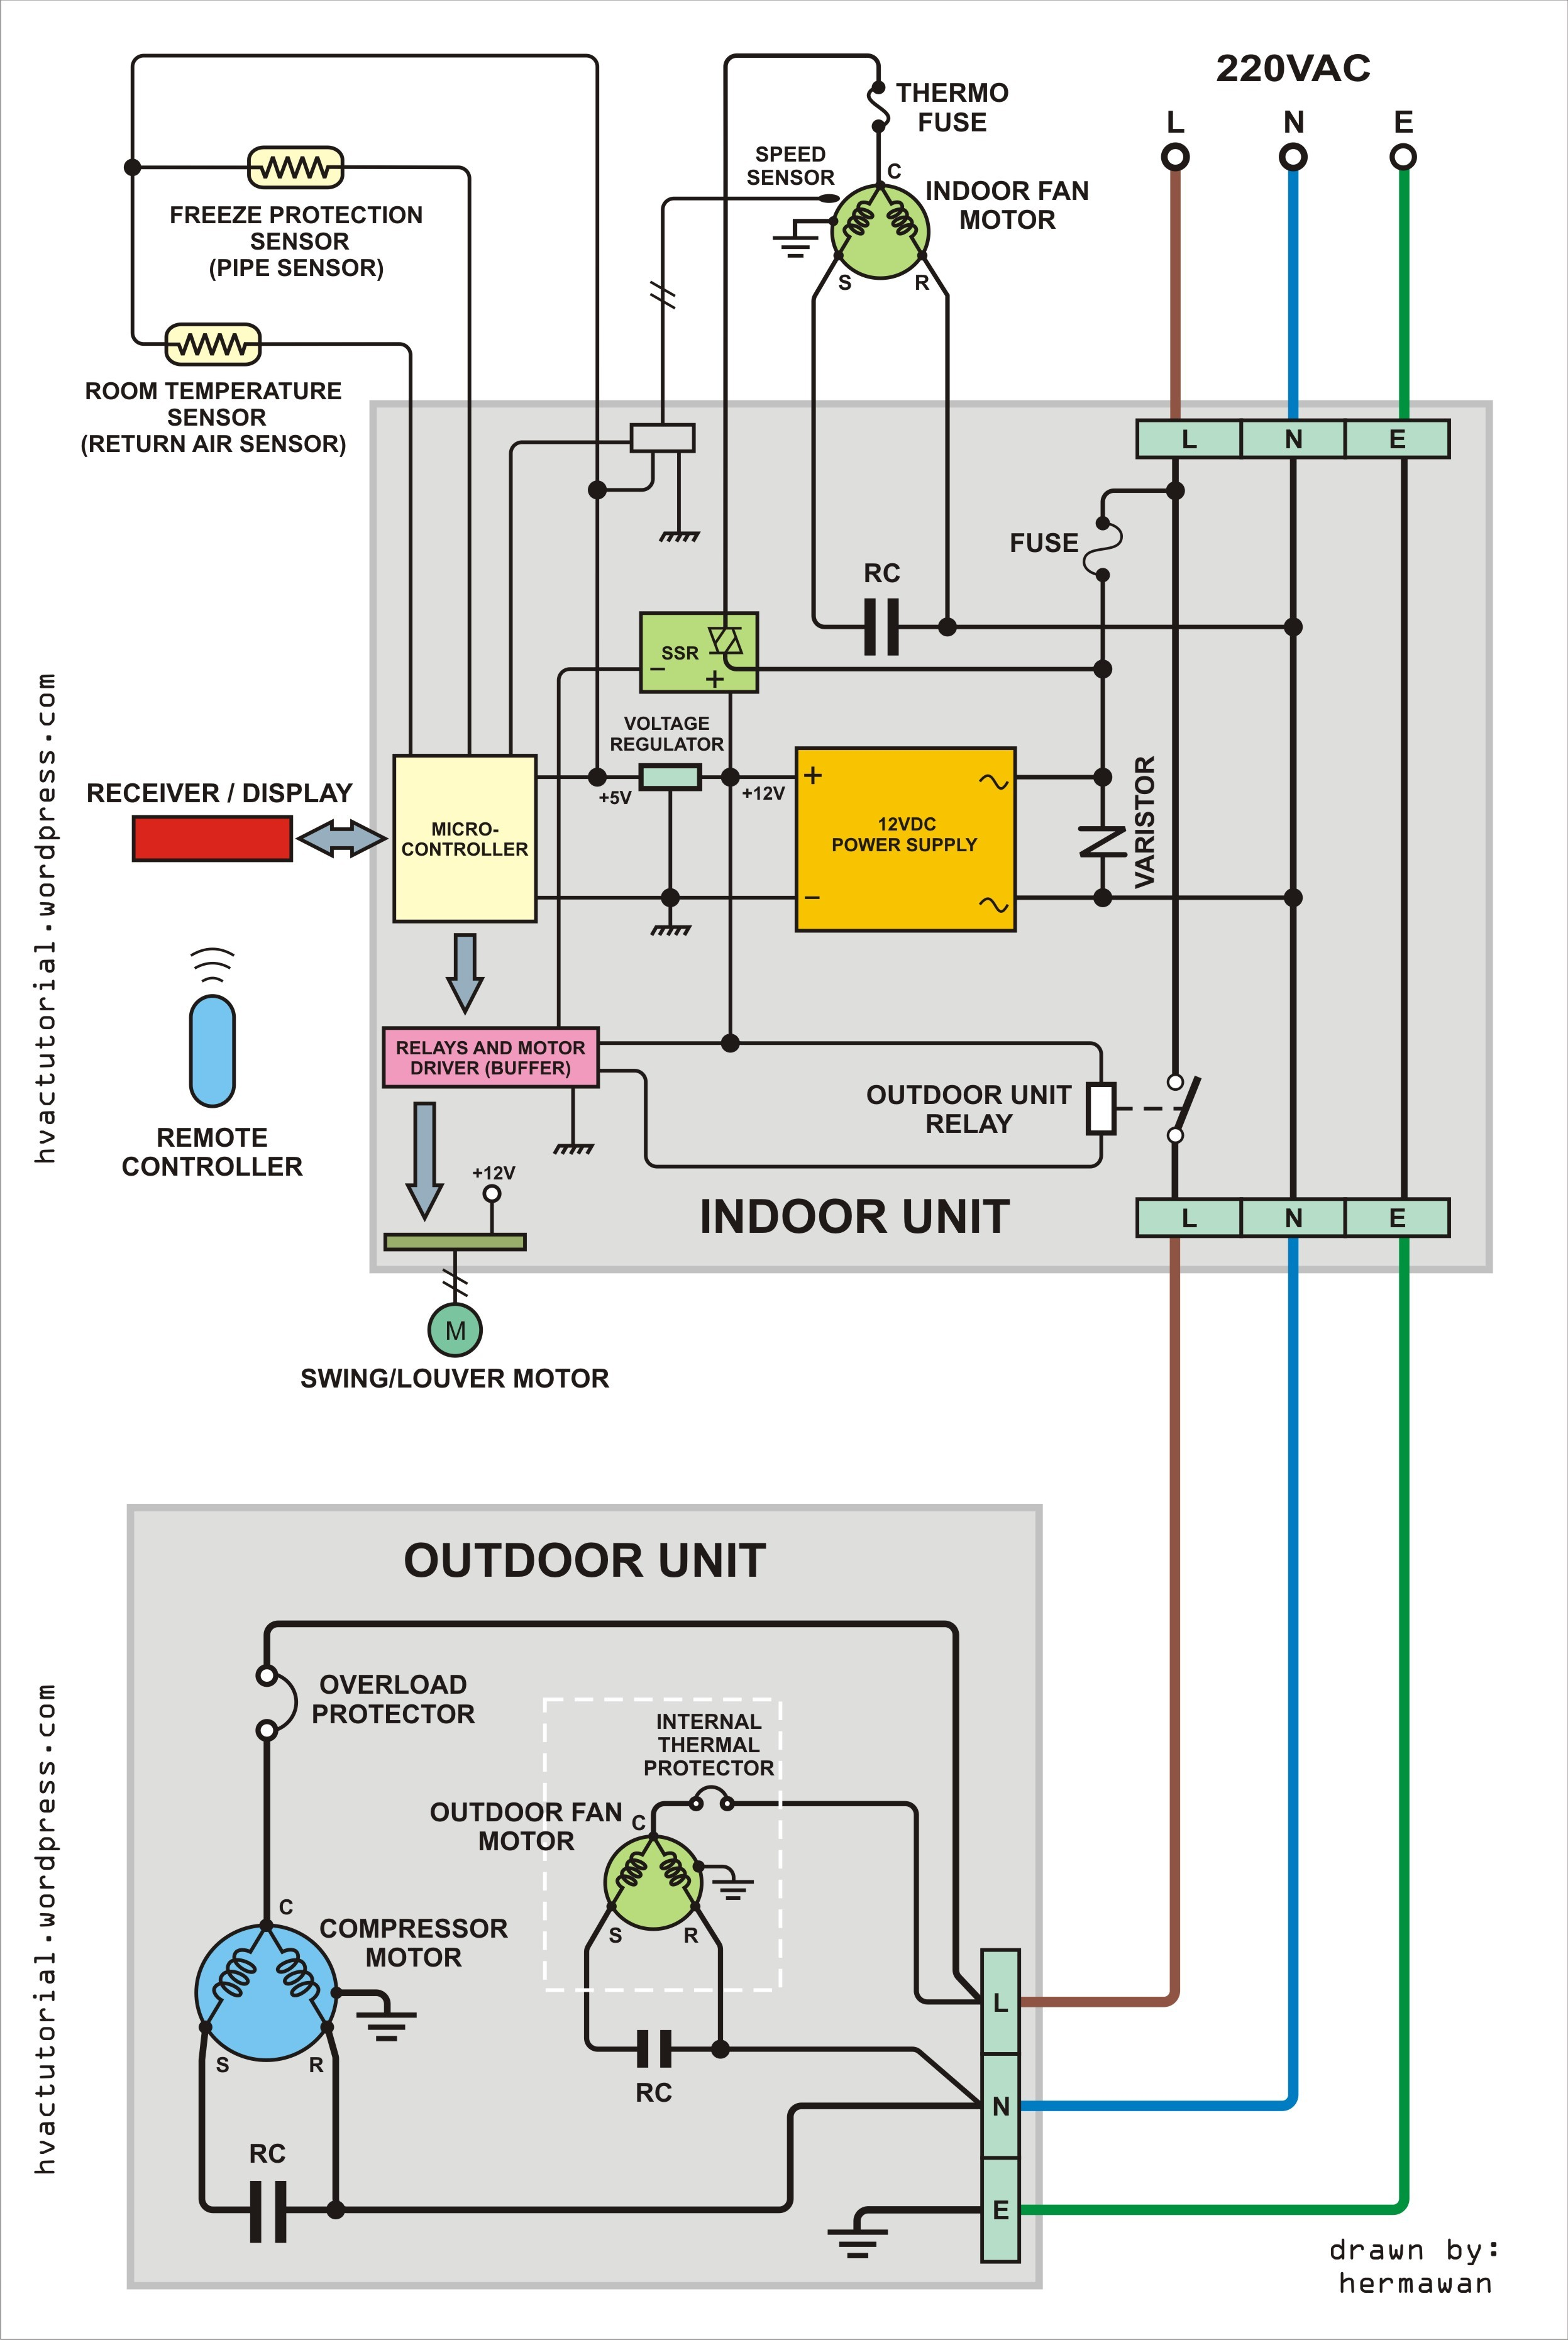 Ideas Wiring Diagram For Gibson Heat Pump The And Trane Pressor Air For Trane